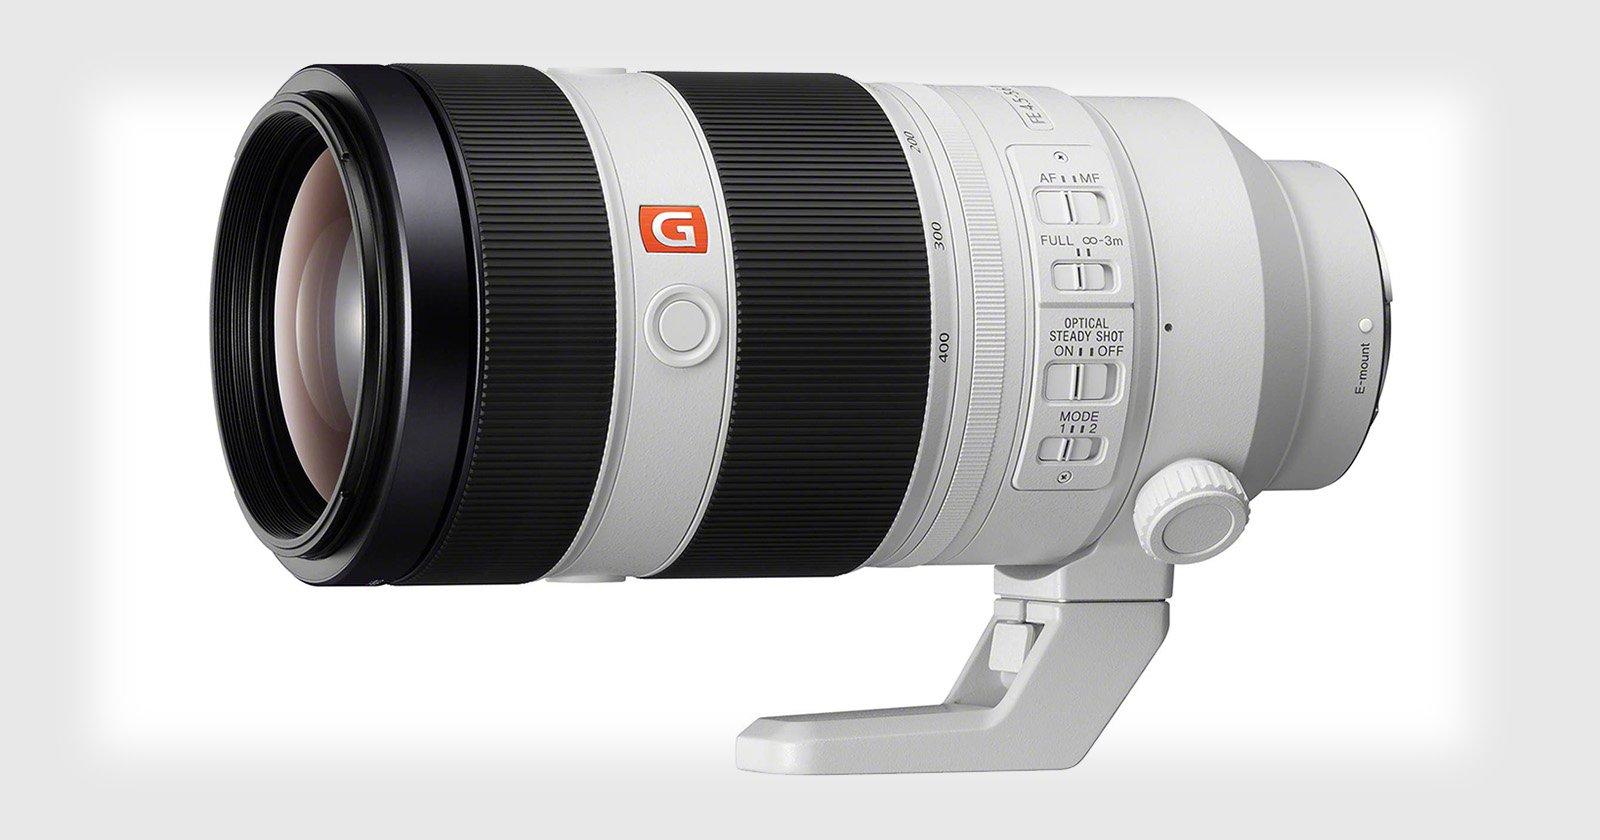 Sony FE 100-400mm f/4.5-5.6 OSS on uus G Master seeria teleobjektiiv